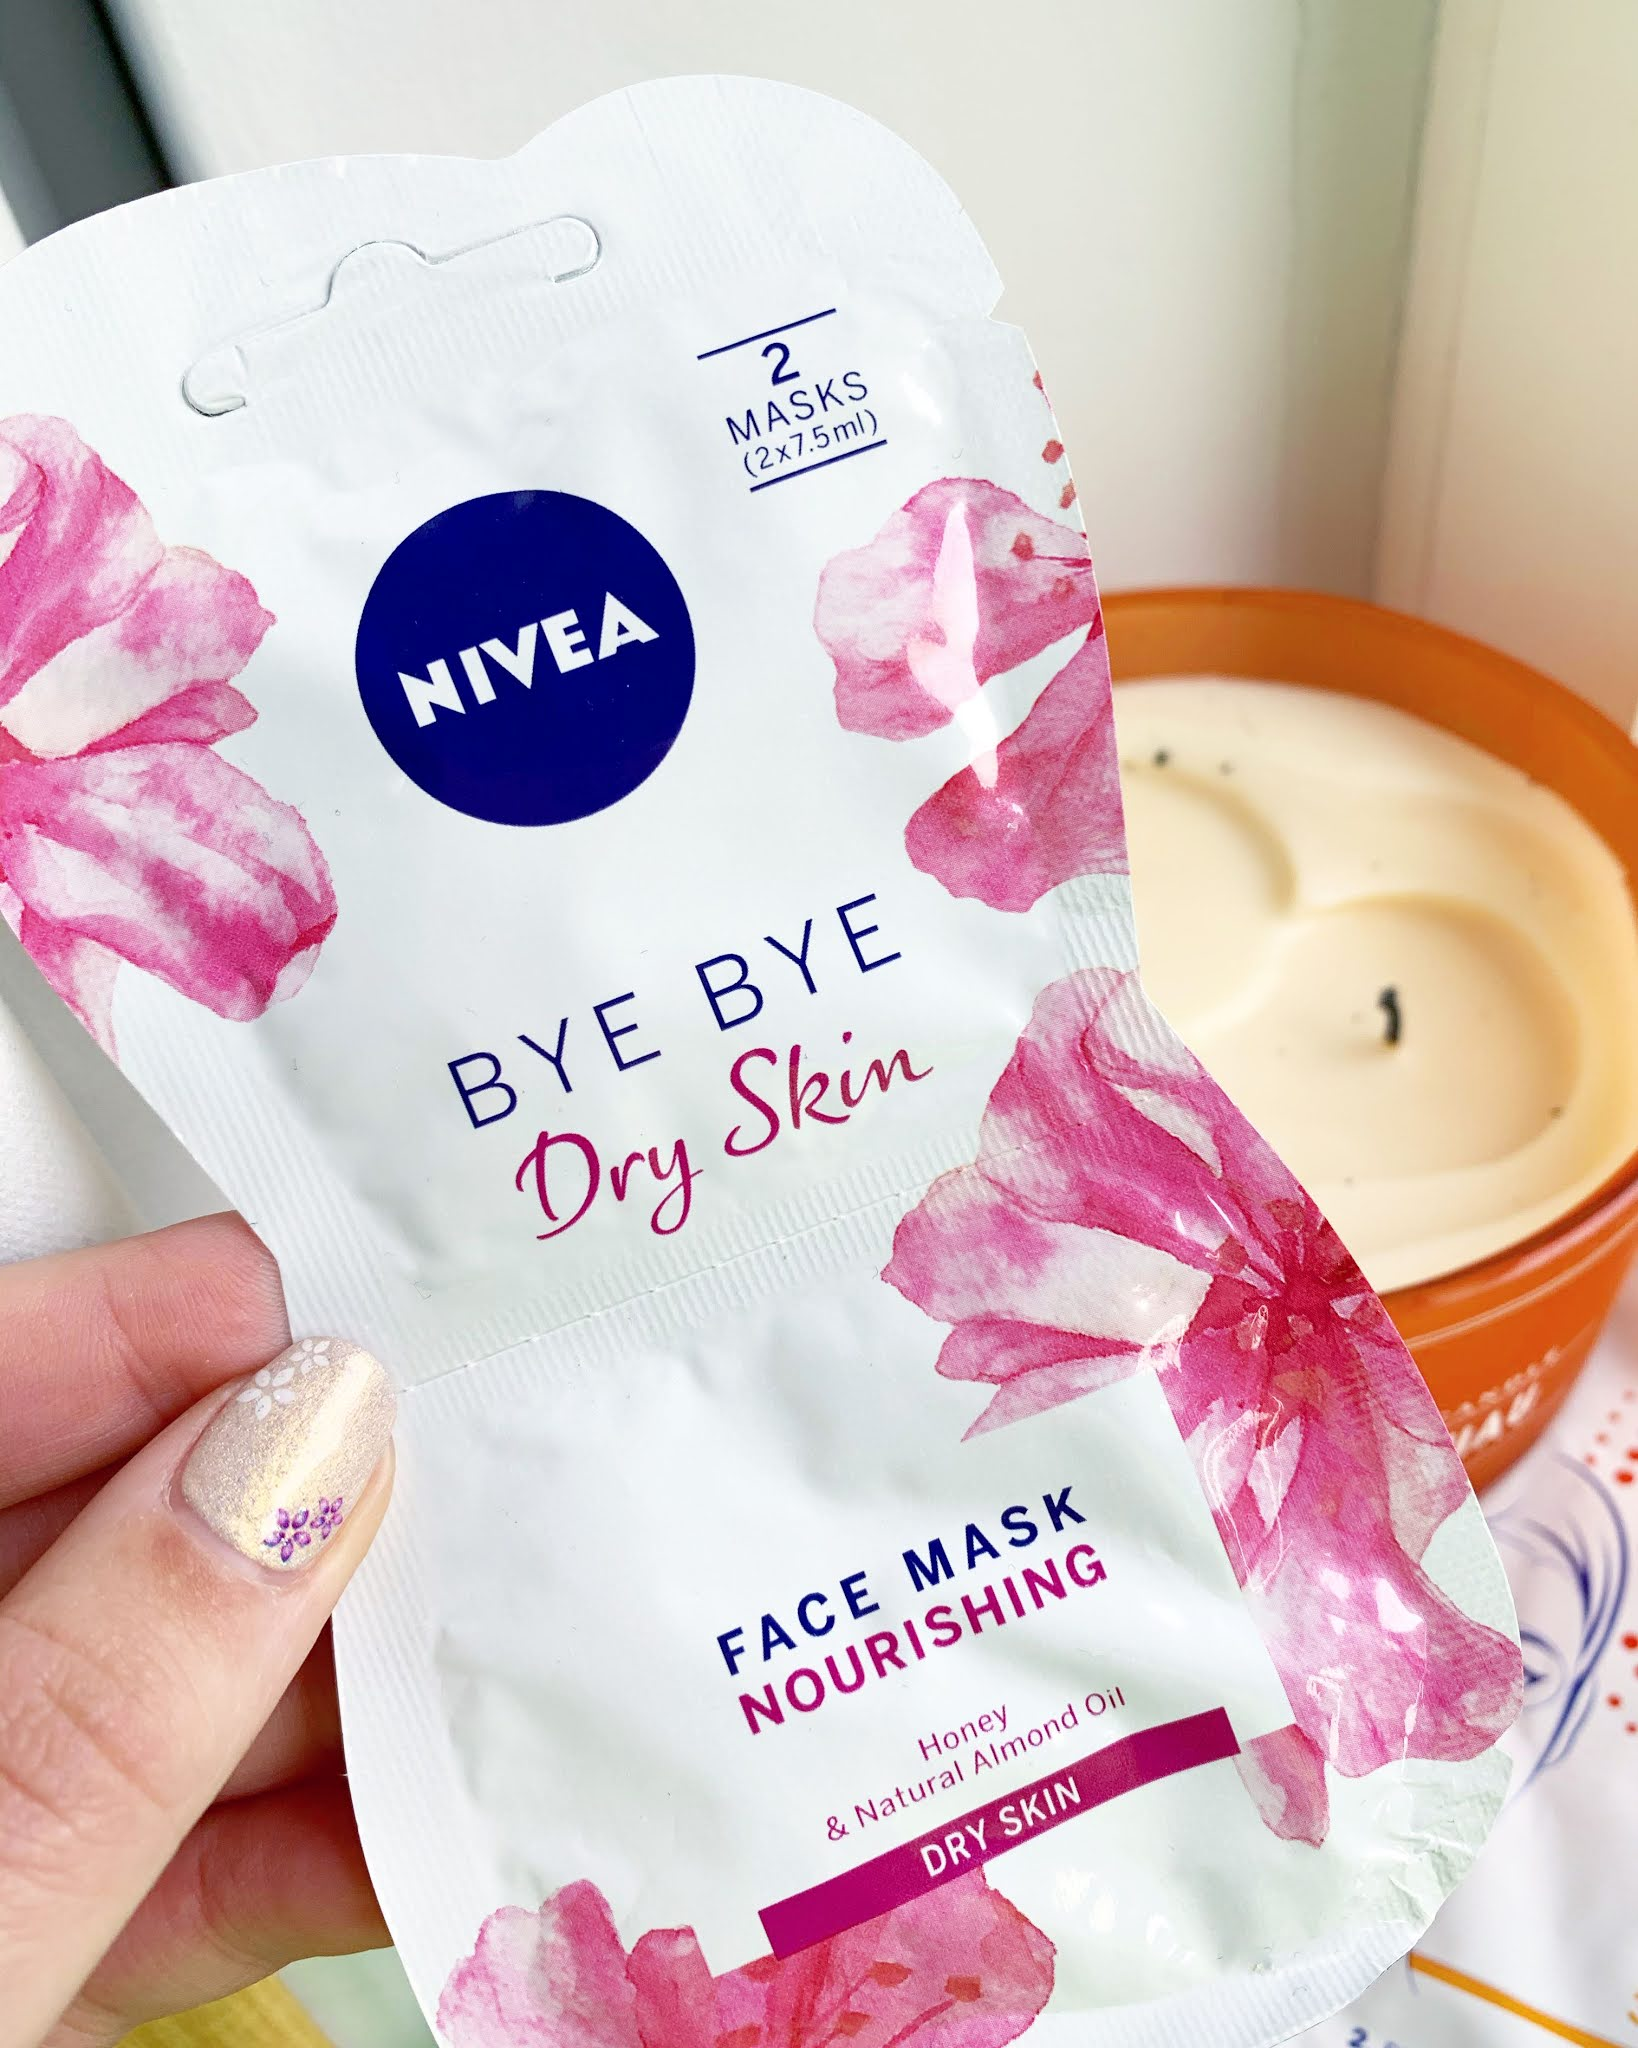 Nivea Bye Bye Dry Skin Face Mask held up